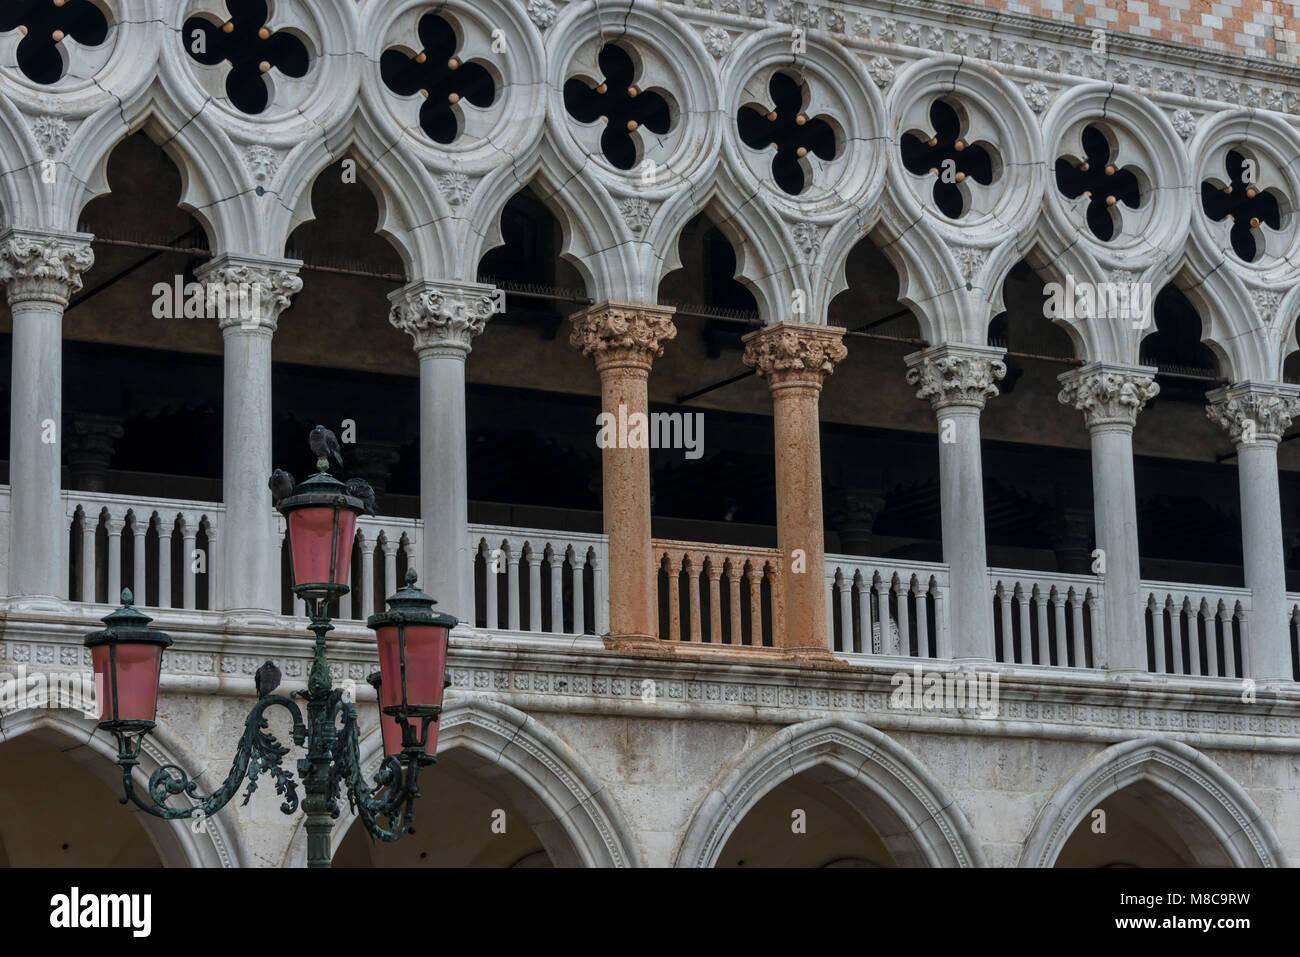 Impressionen aus Venedig - Palazzo Ducale Stock Photo